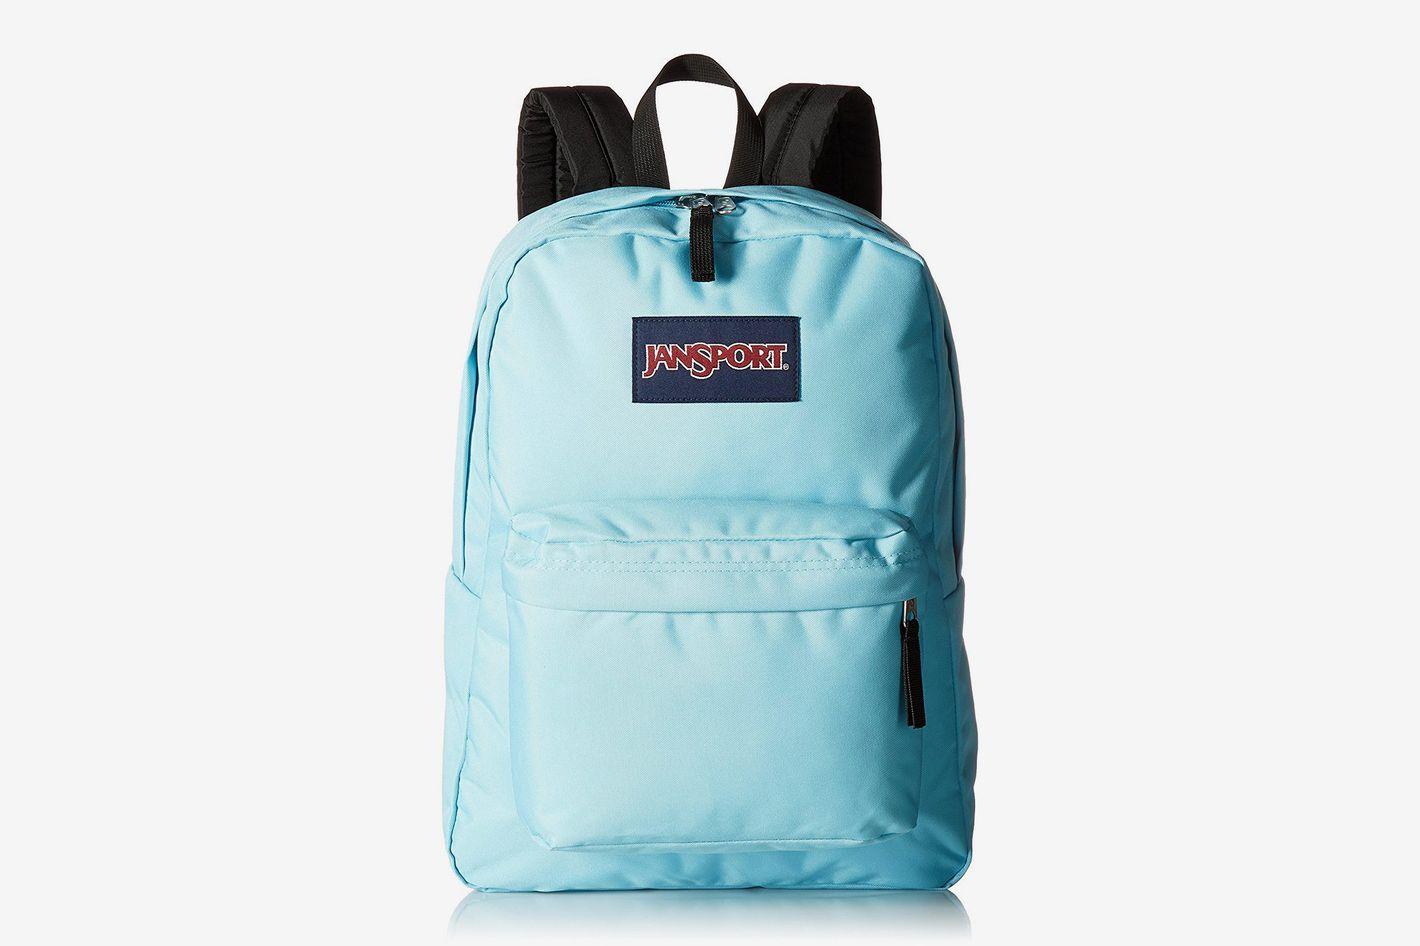 6d813efb0b JanSport Unisex Superbreak Backpack at Amazon